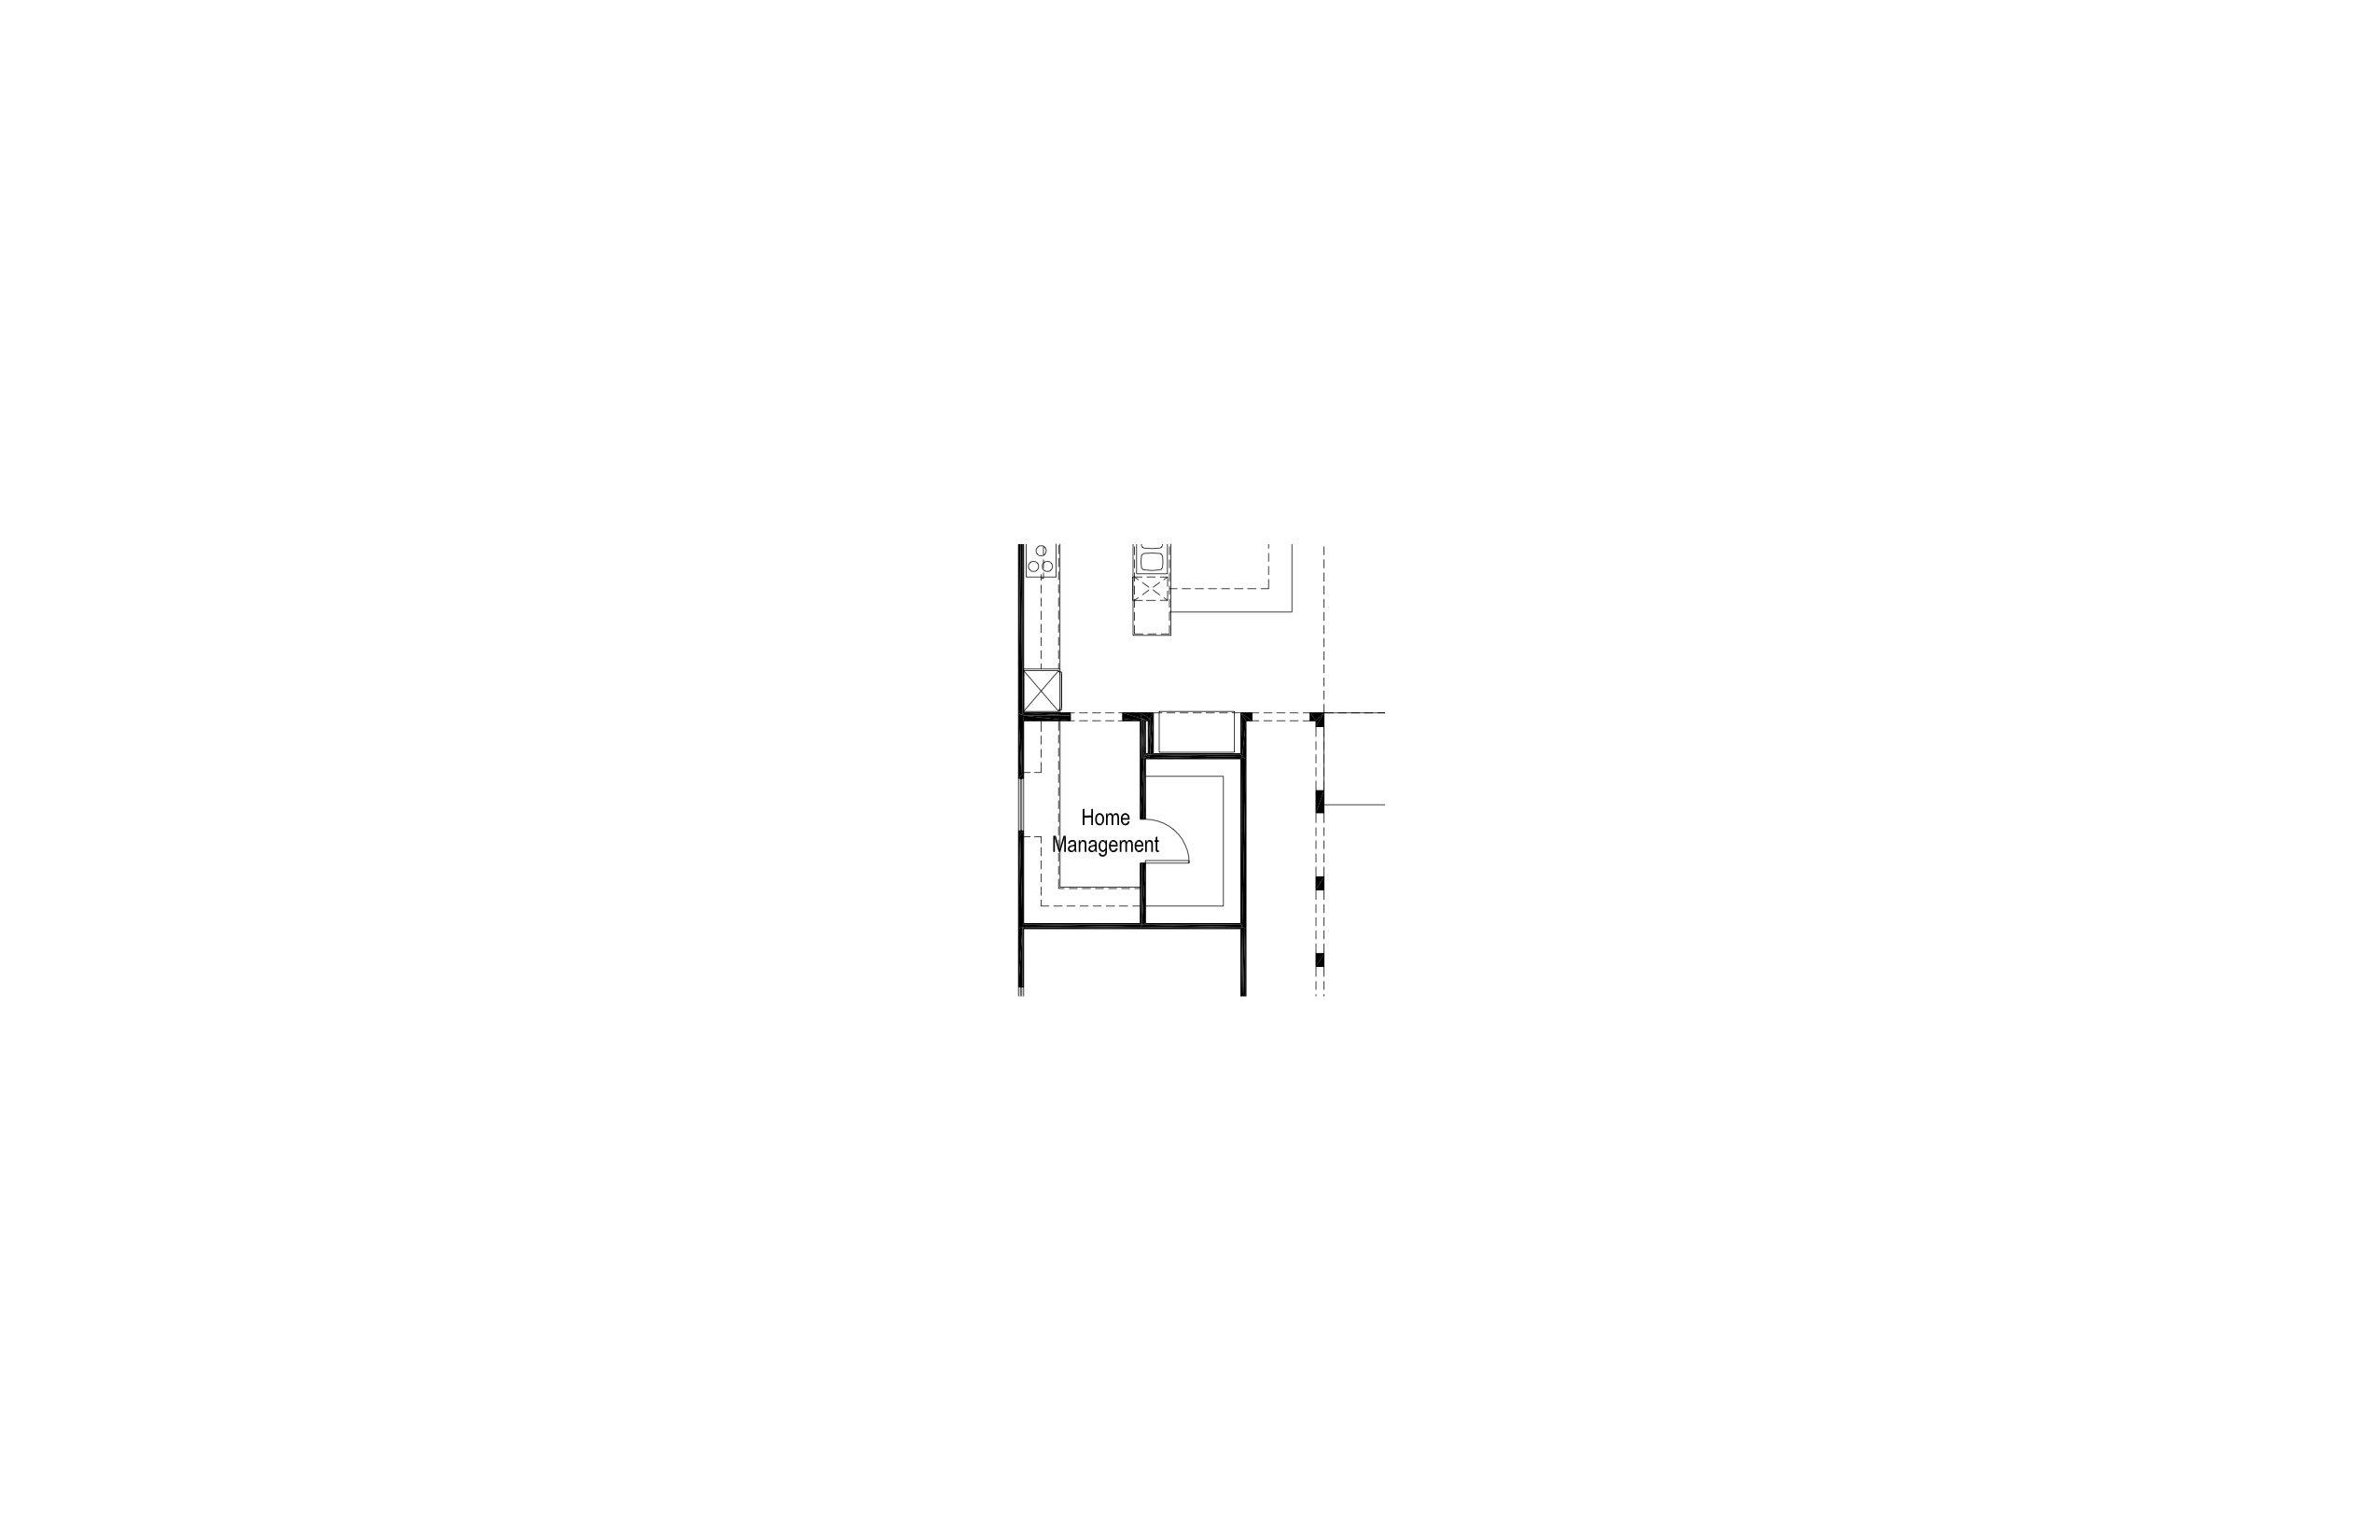 Plan 2 - Opt Home Management